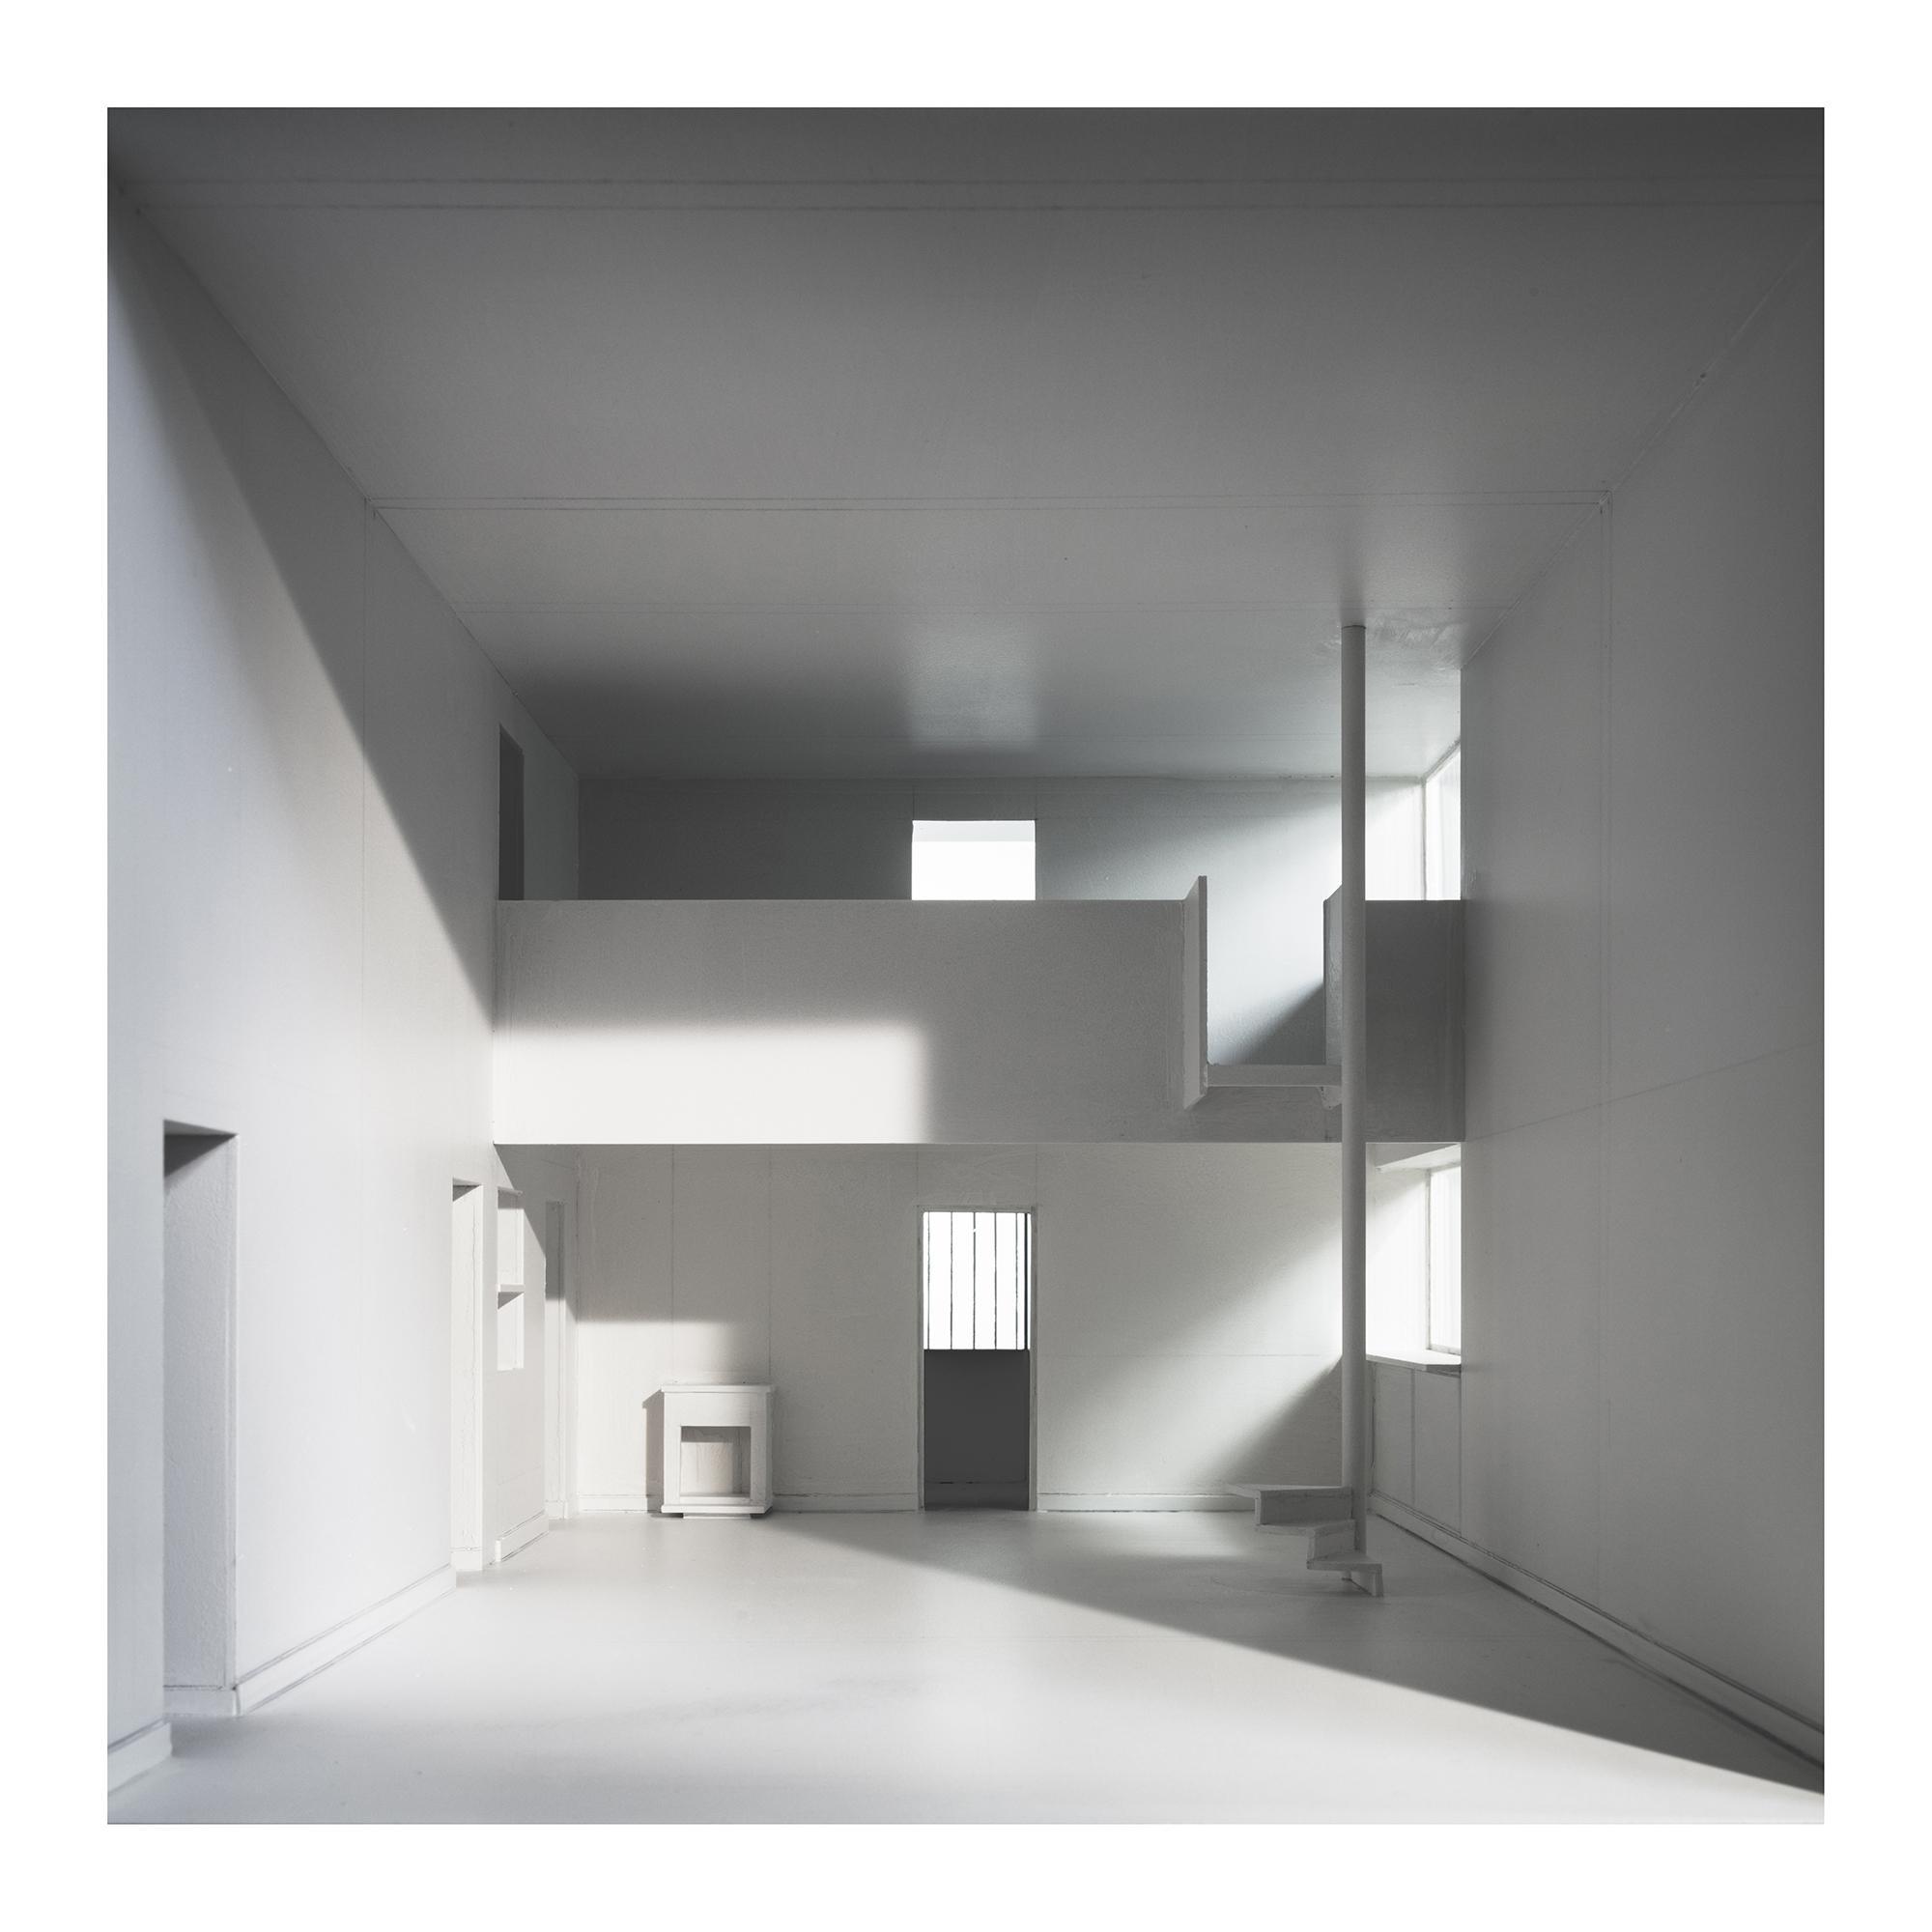 L.h.dc-2 Maison Citrohan. 1920. Le Corbusier. Impresión digital, papel algodón Hahnemühle. 120X120cm. Edición 5+2 P.A.